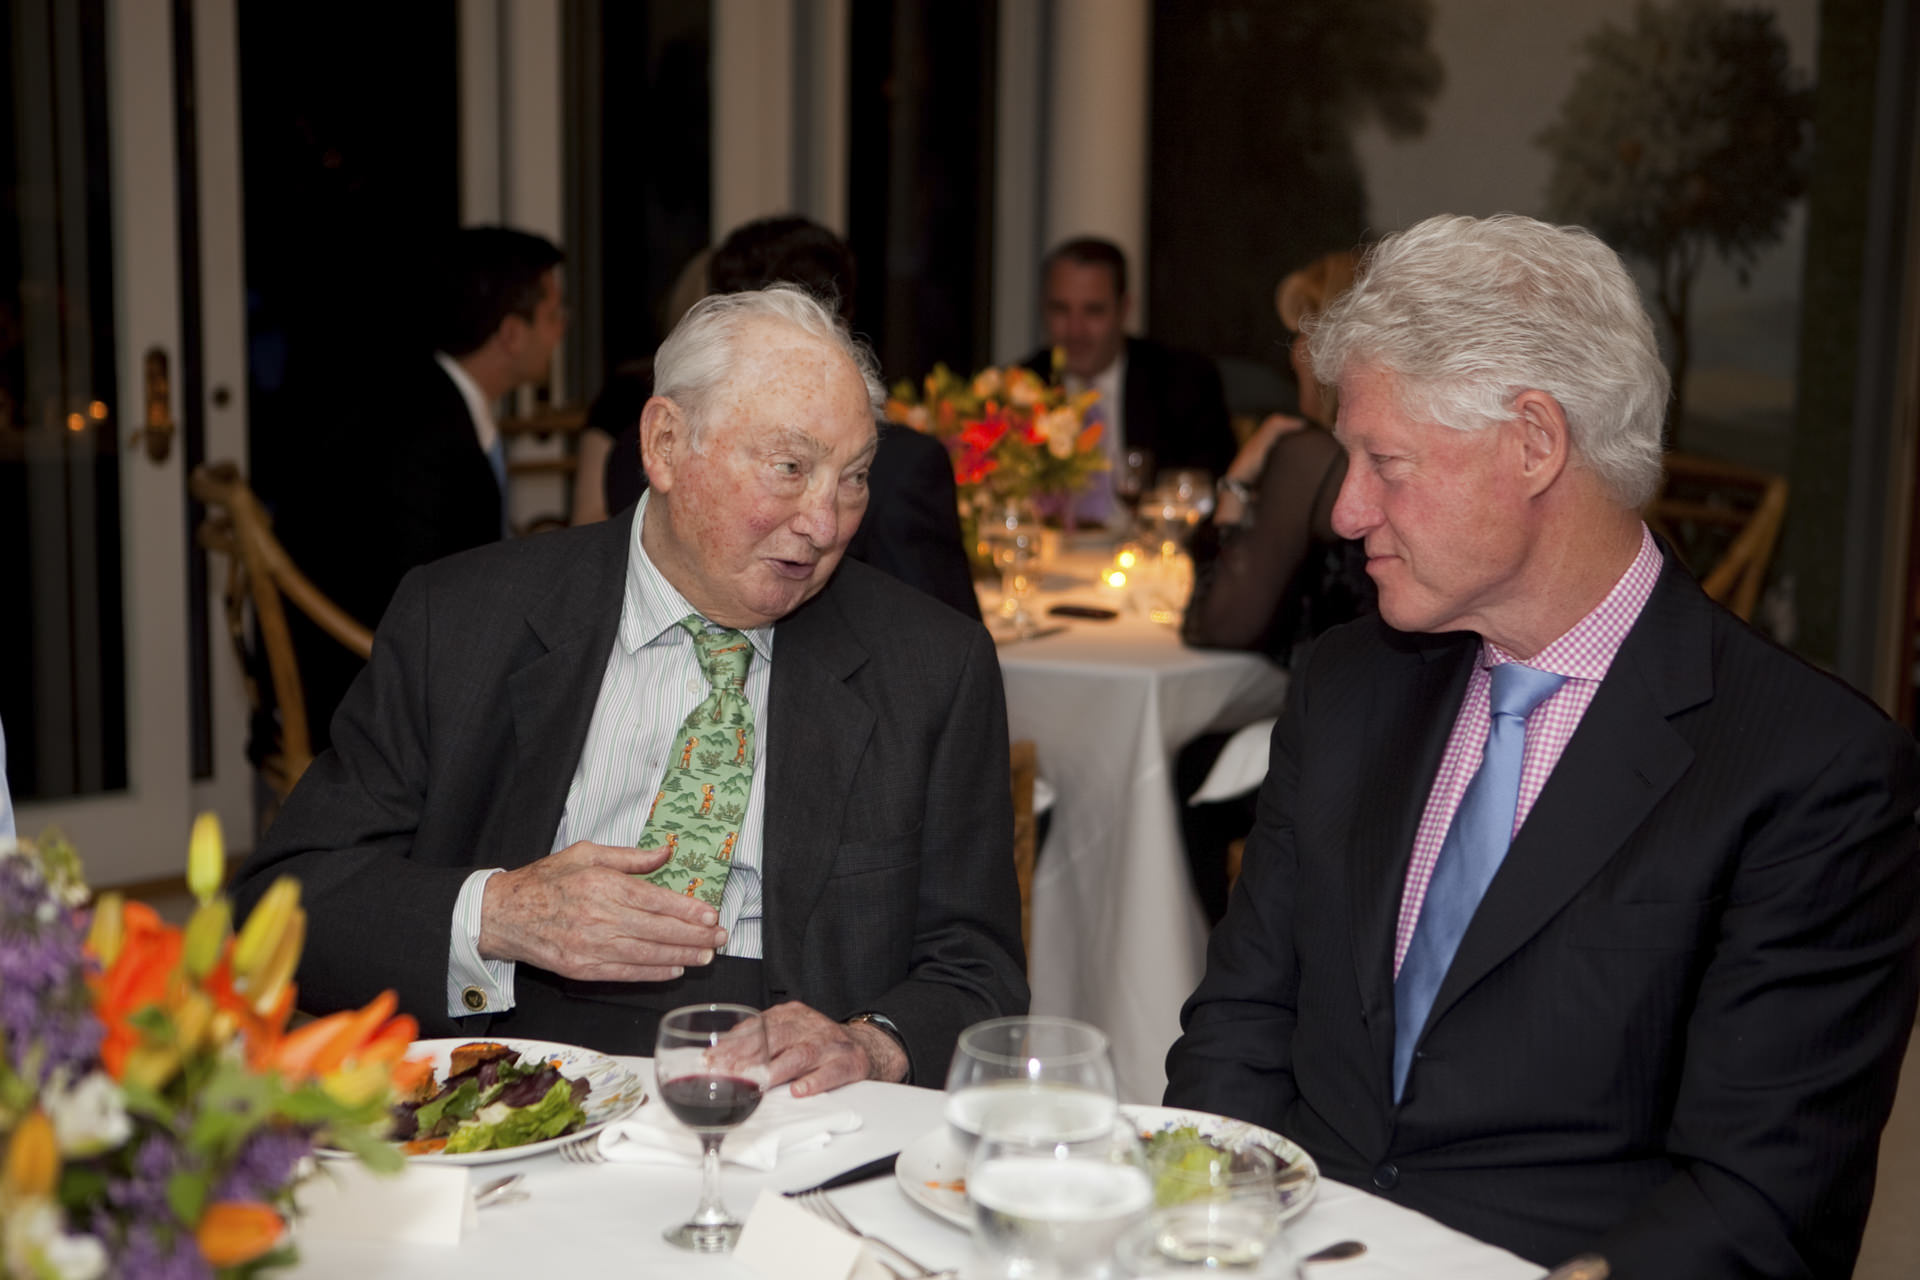 President William Jefferson Clinton benefit